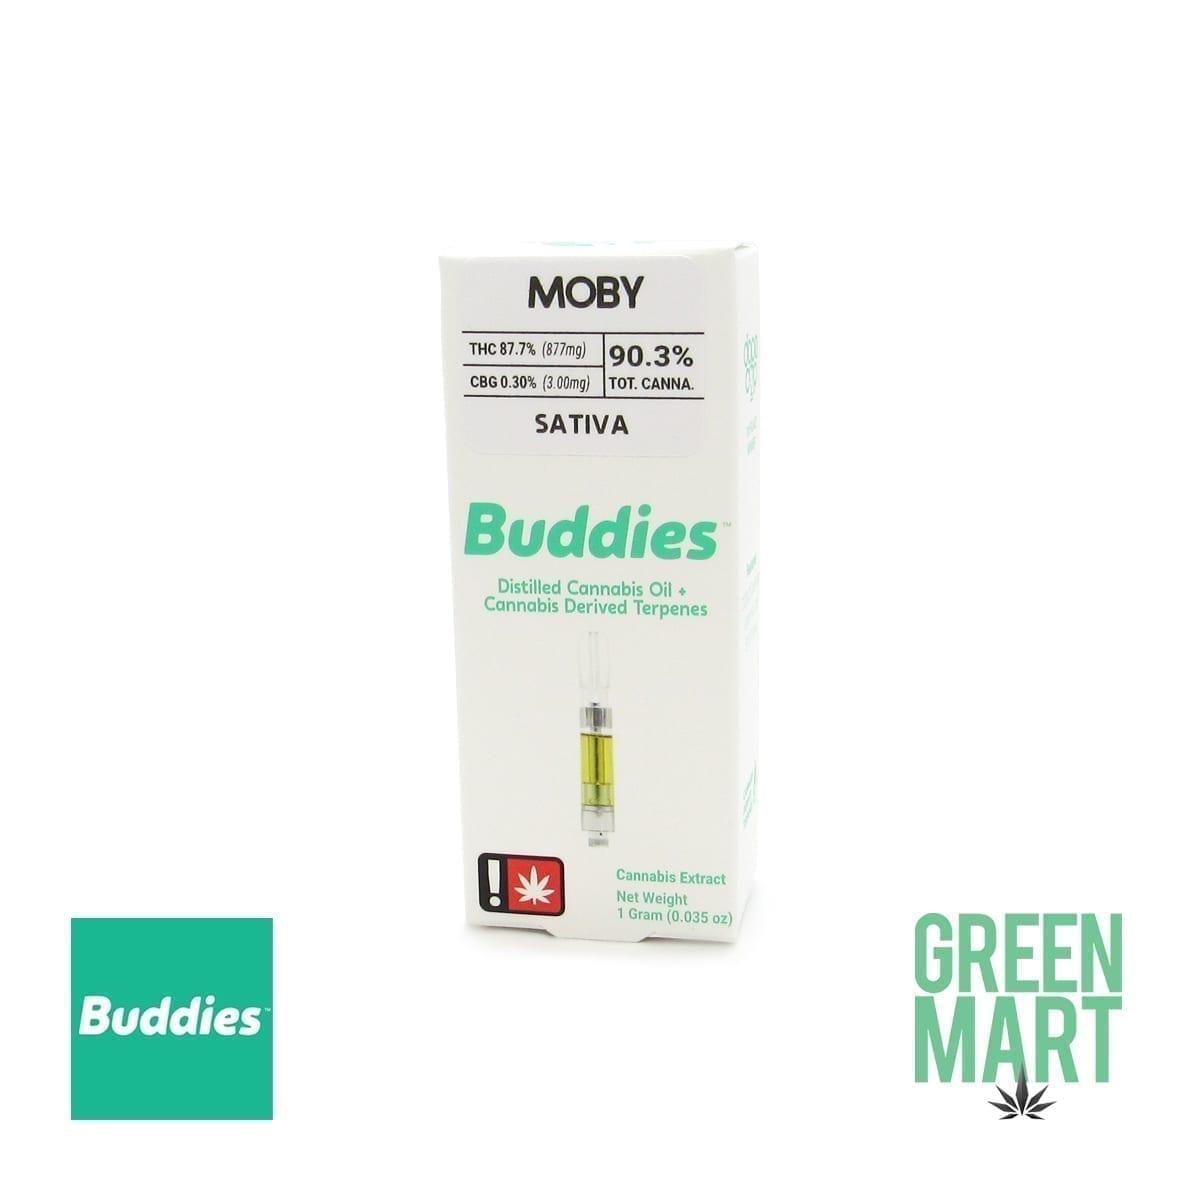 Buddies Brand Distillate Cartridge - Moby